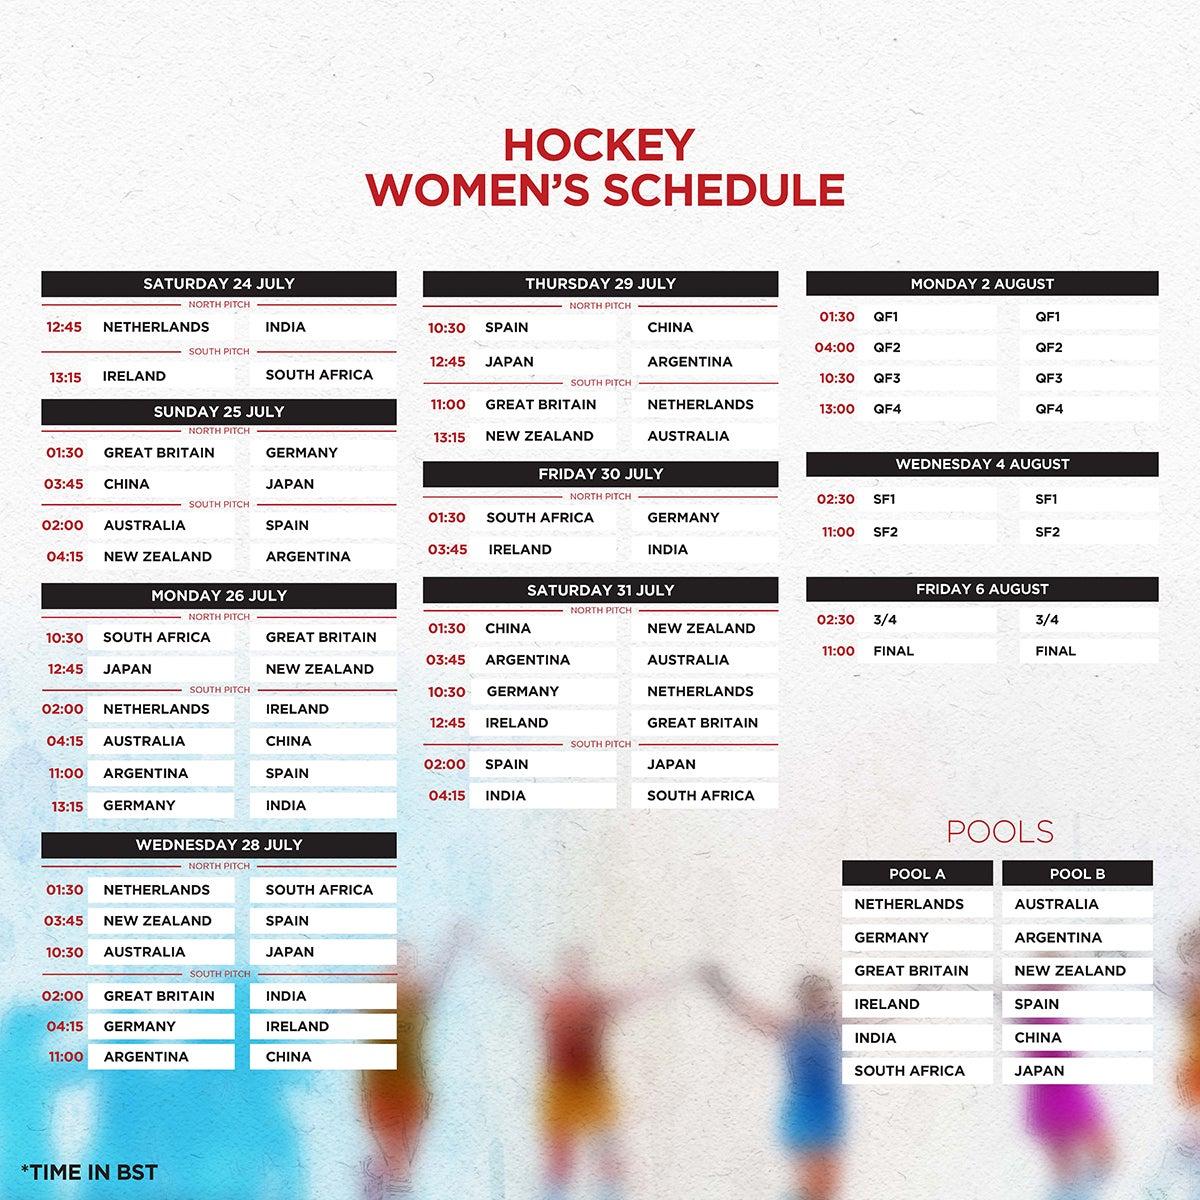 Tokyo 2020 Women's Hockey Schedule